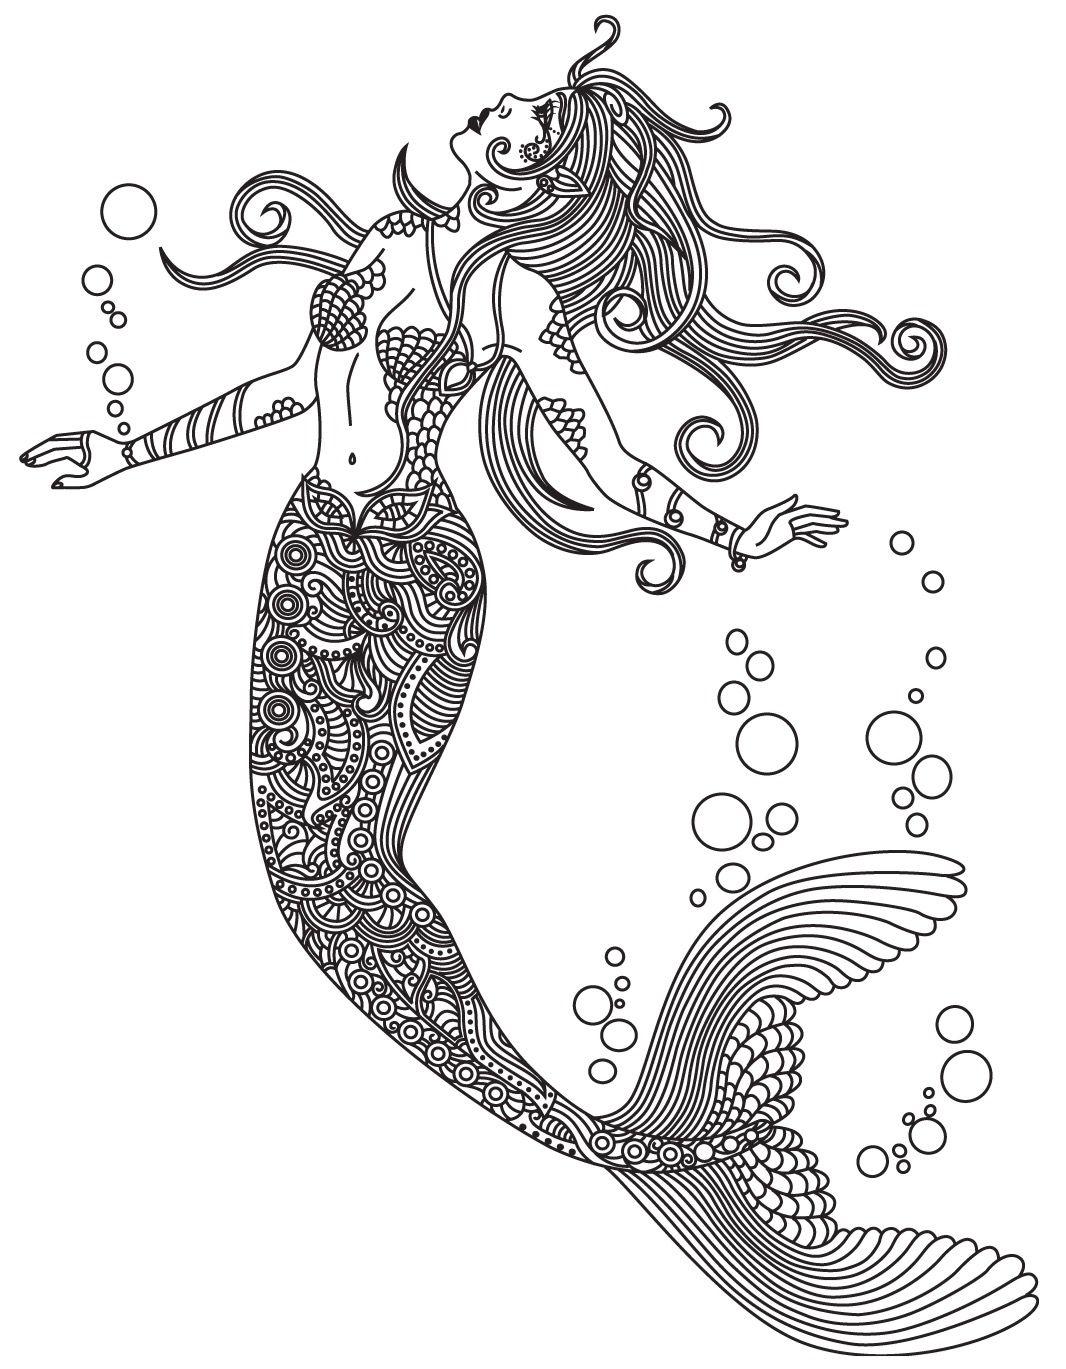 Mermaid SeaWorld coloring page | Colorish : coloring book app for ...